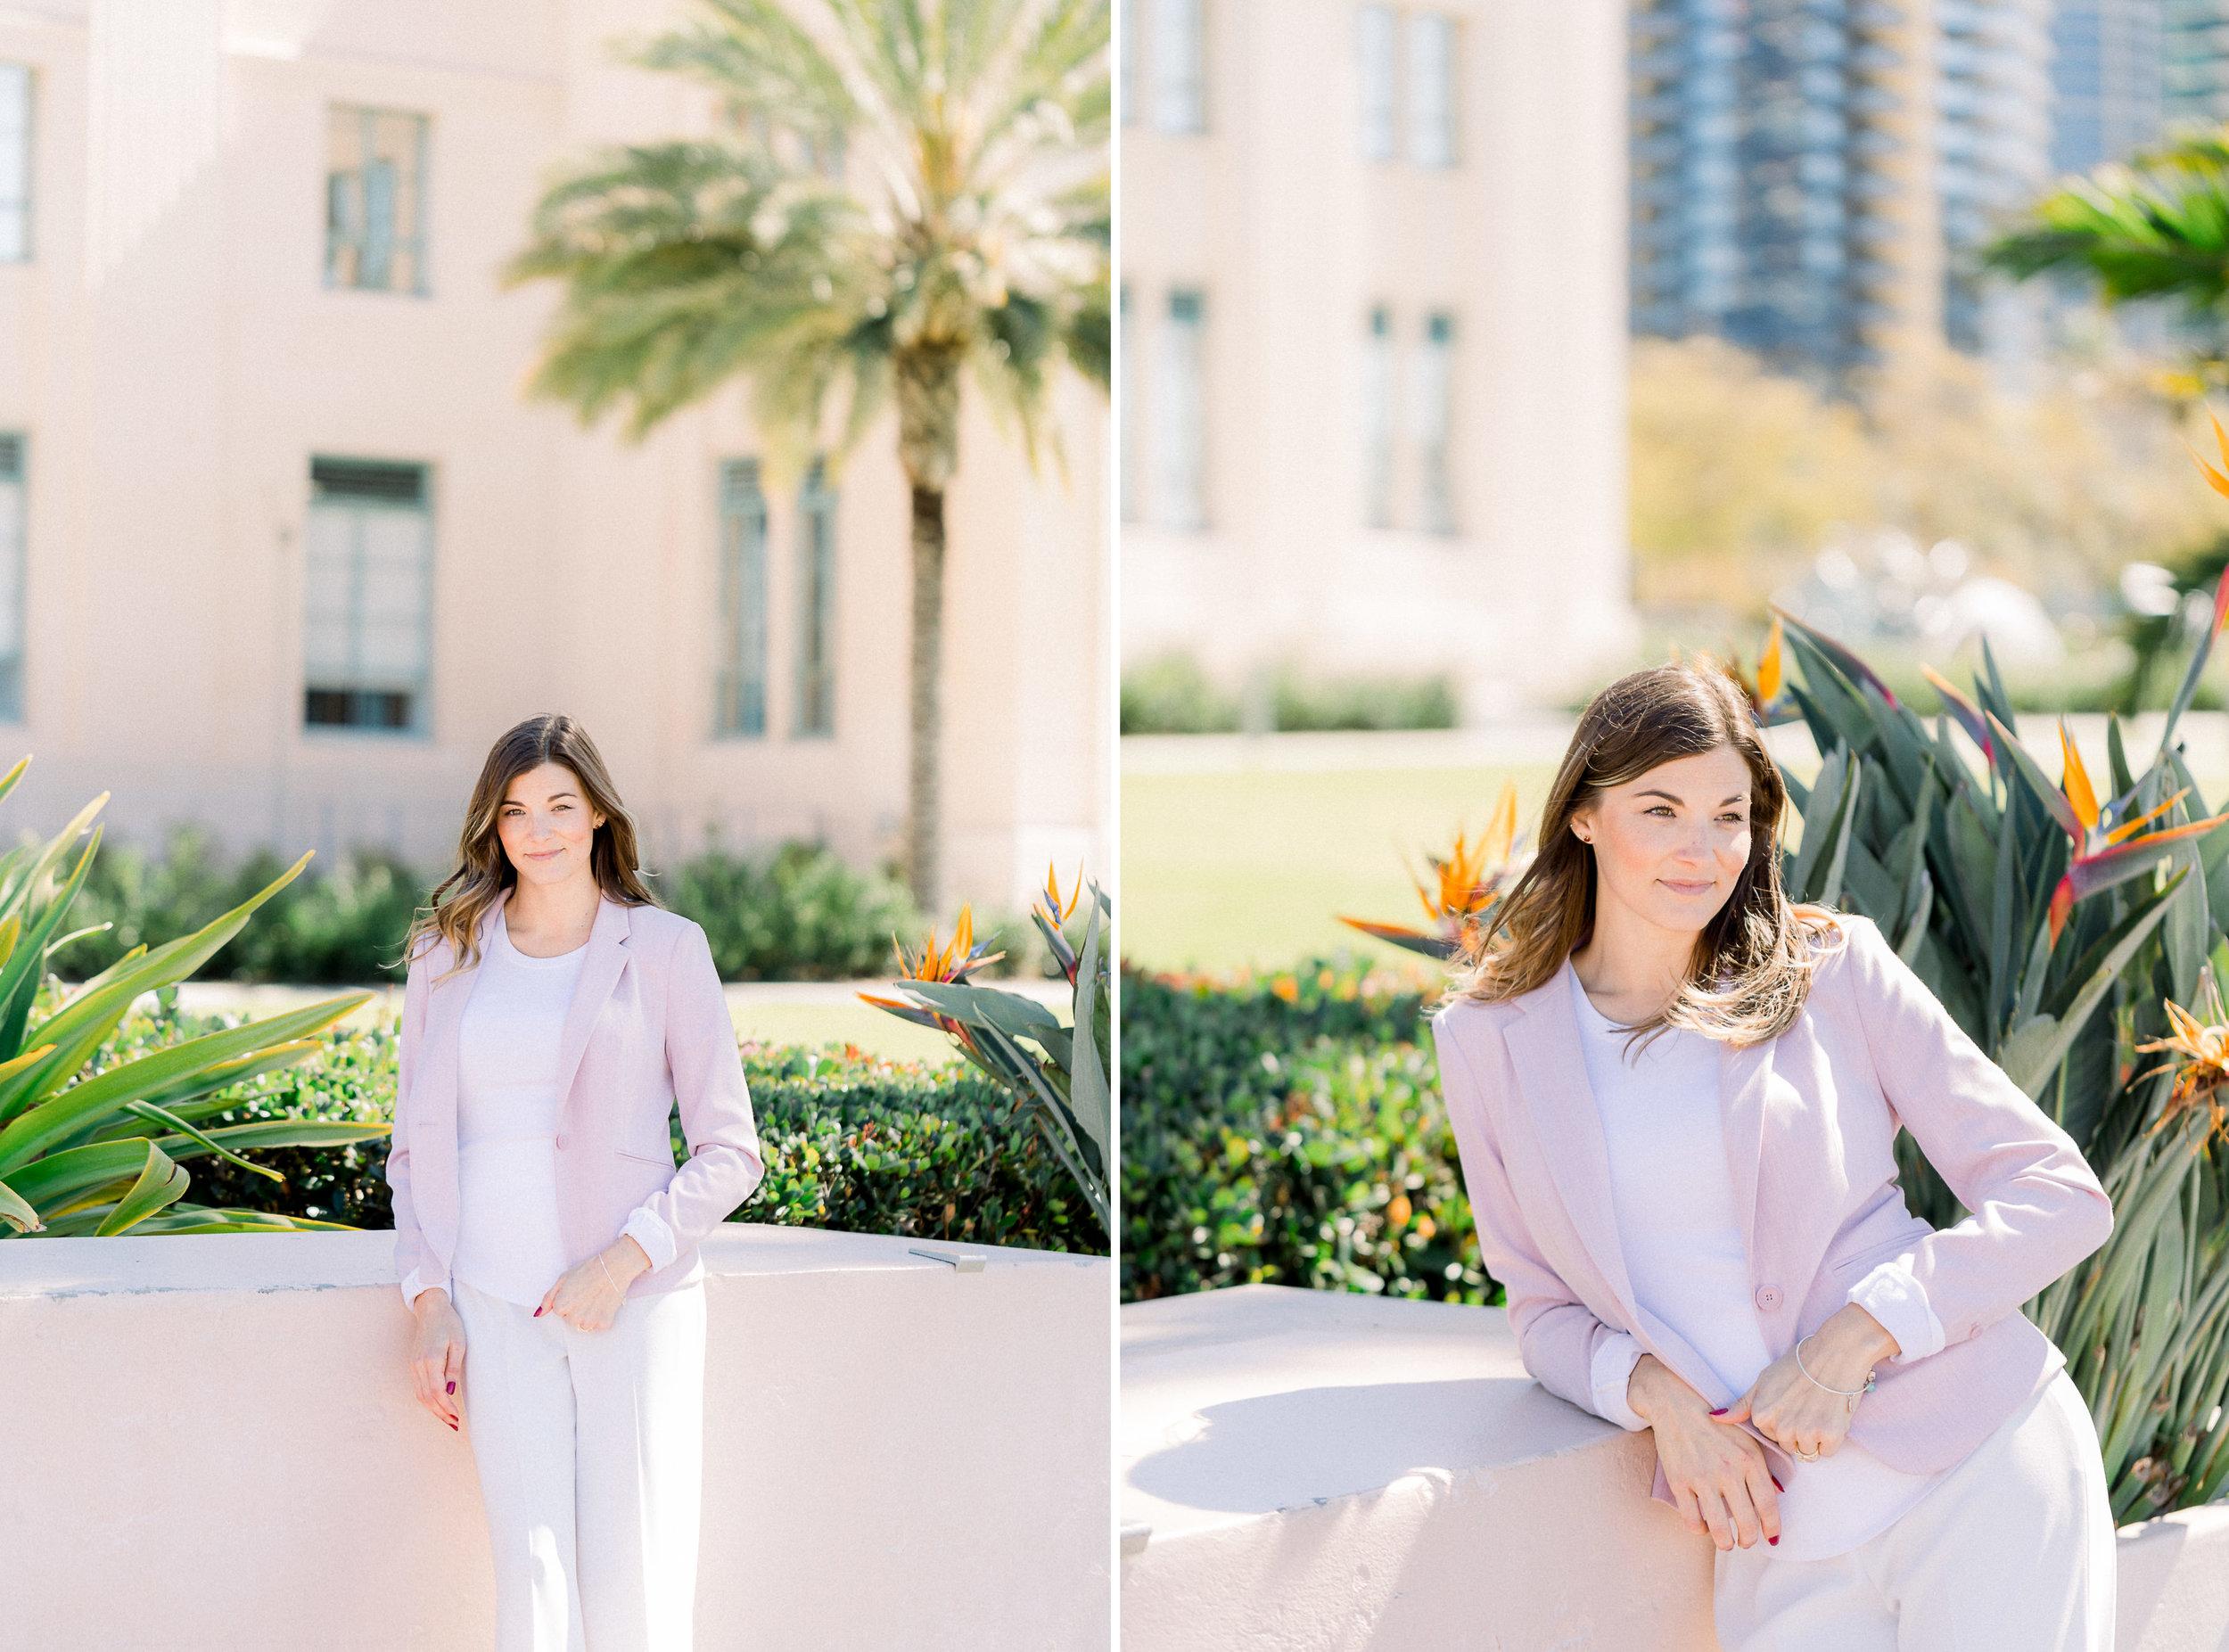 Claire_and_Dan_San_Diego_Administration_Building_Elopement_Alyssa_Boynton_Photography-38.jpg